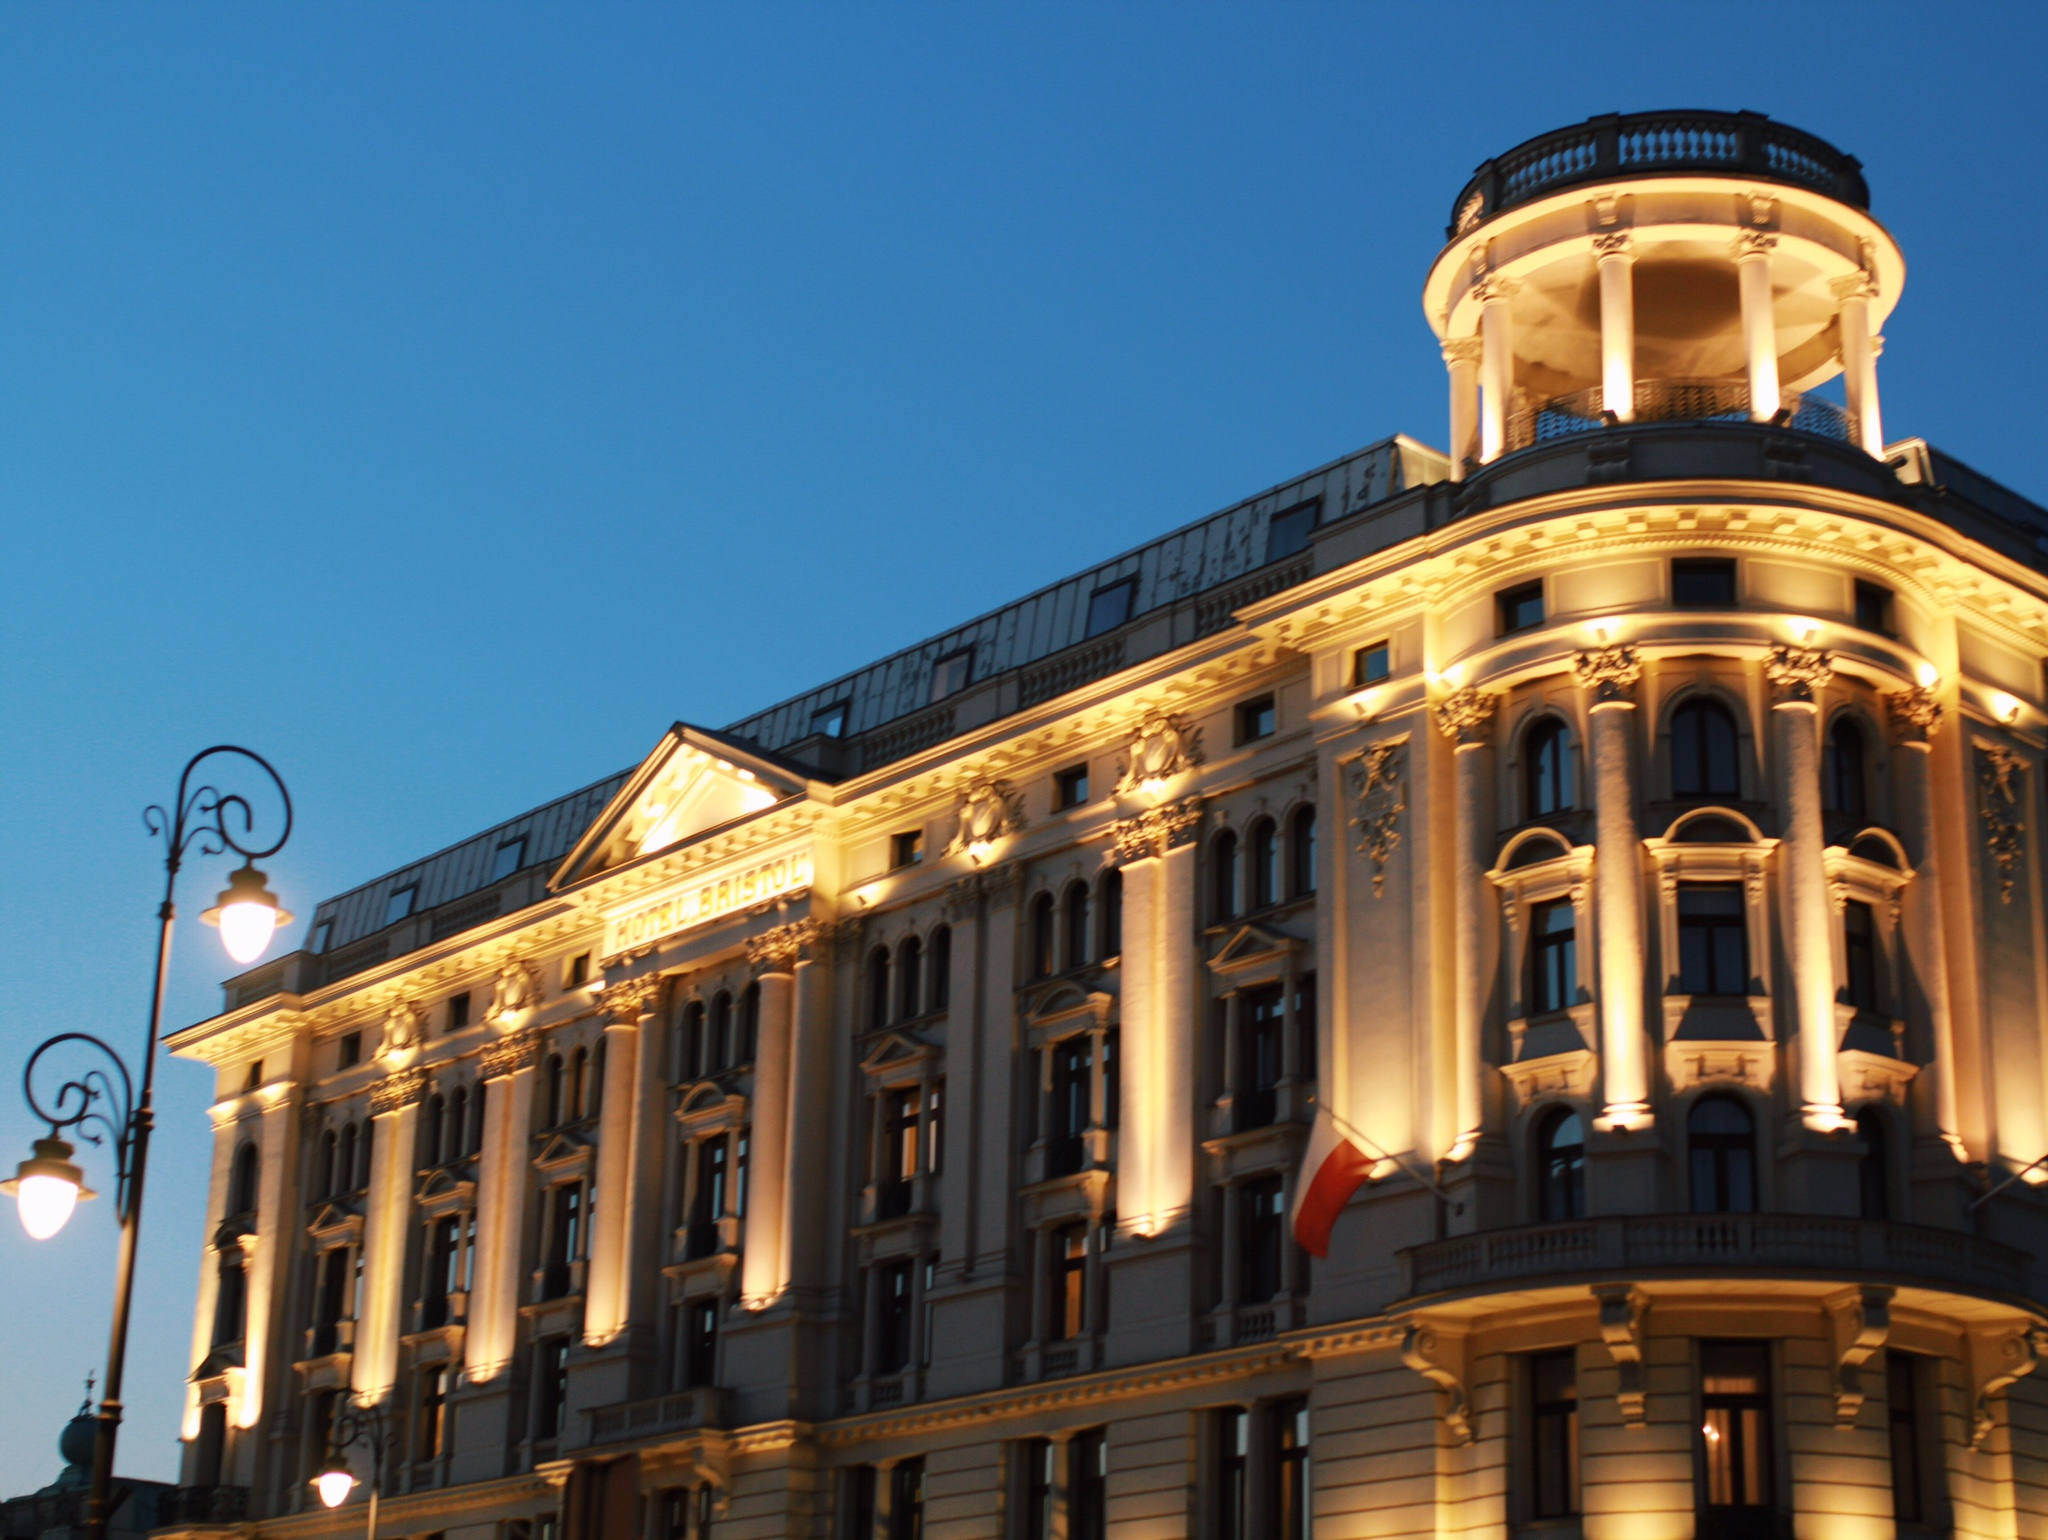 Hotel Bristol after sunset